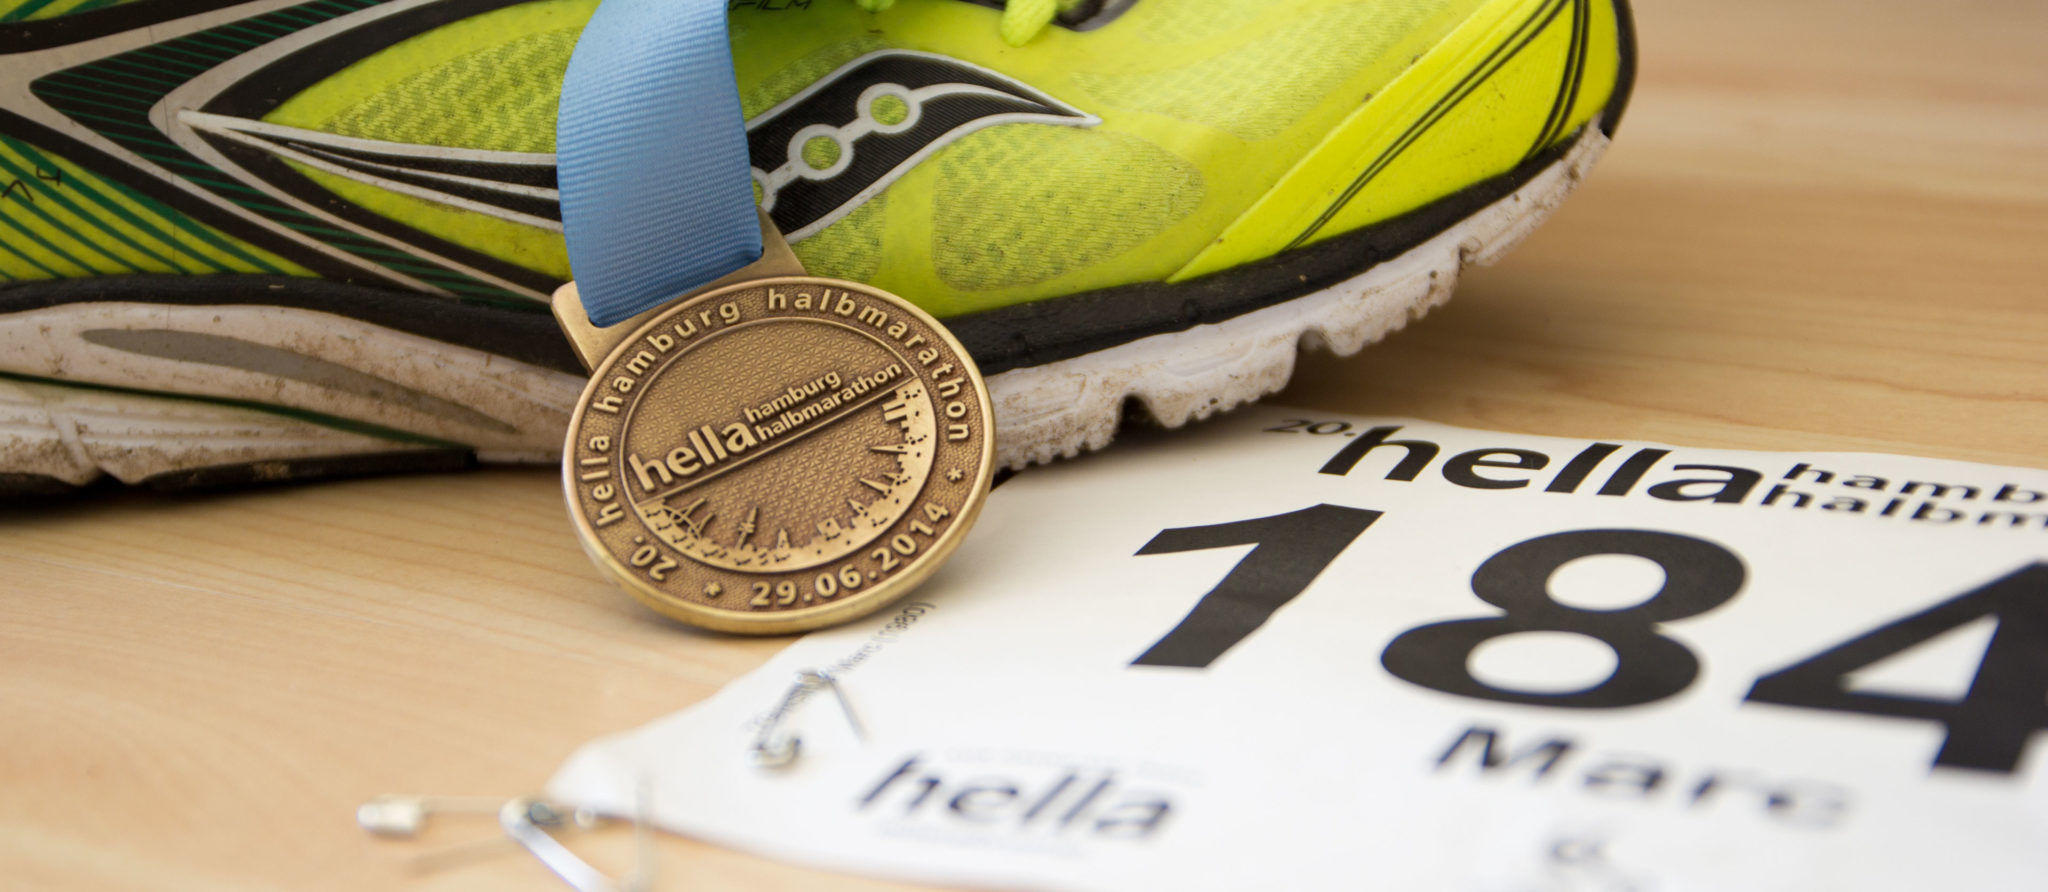 Hella Halb-Marathon 29.06.2014